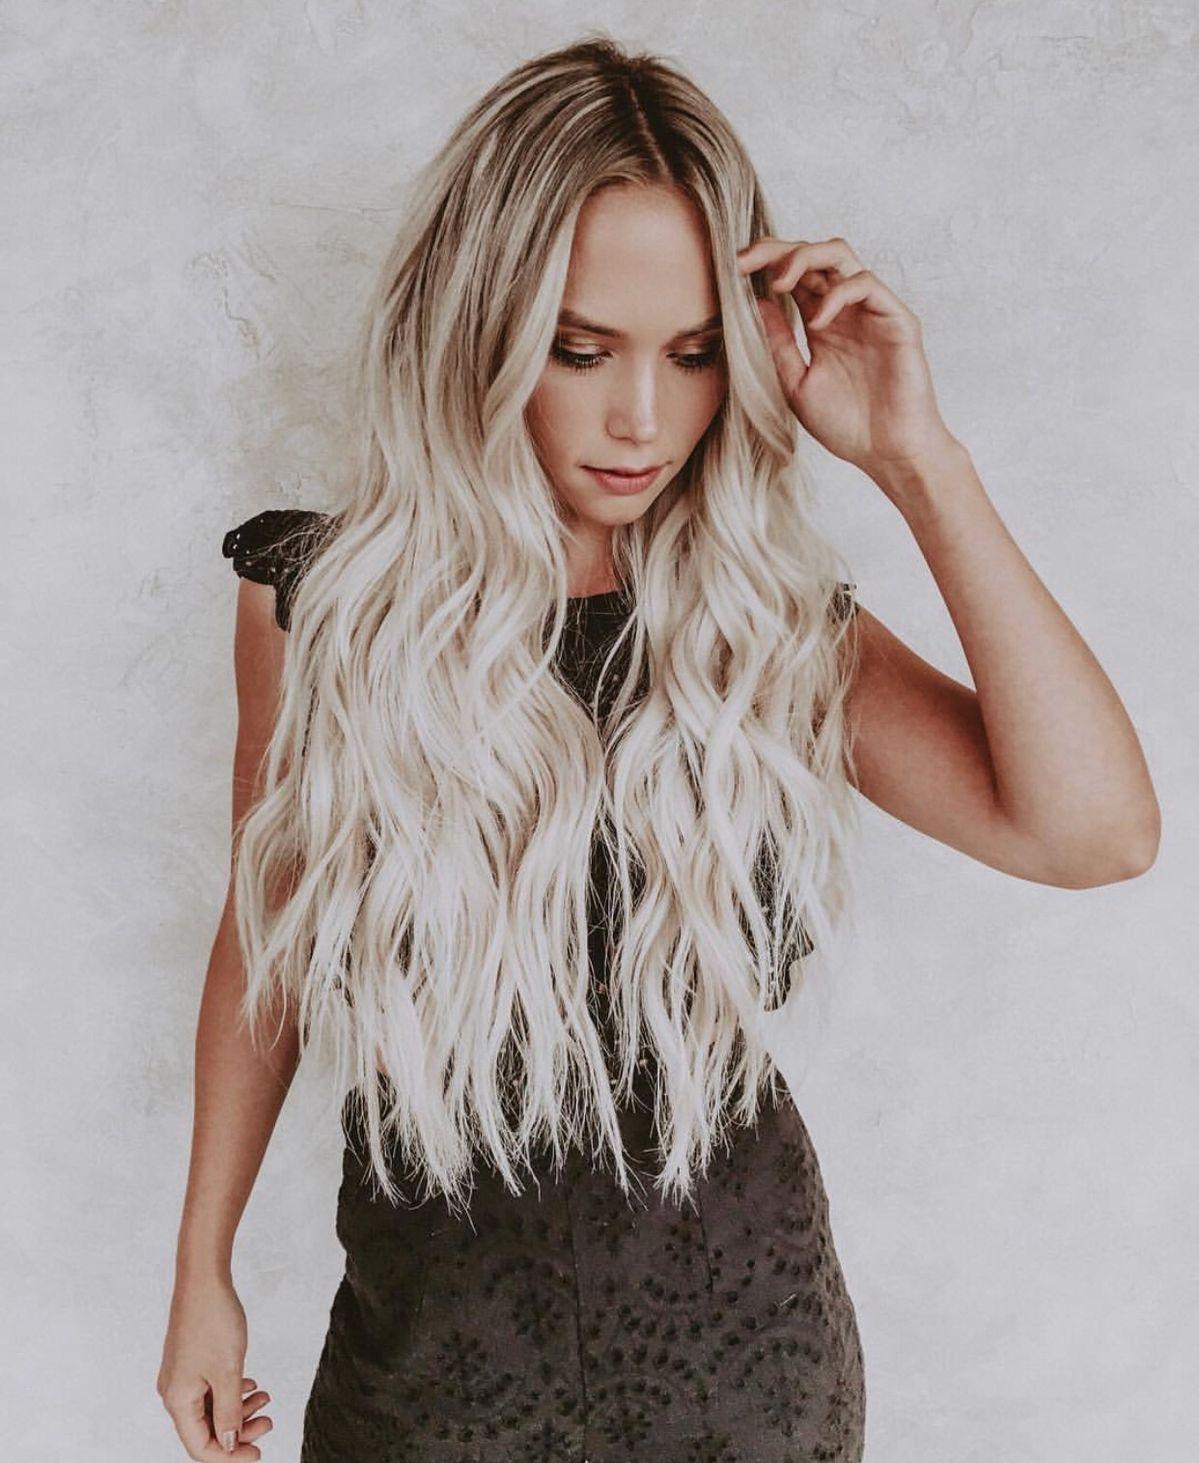 Hair Inspiration 2019-05-01 02:36:52